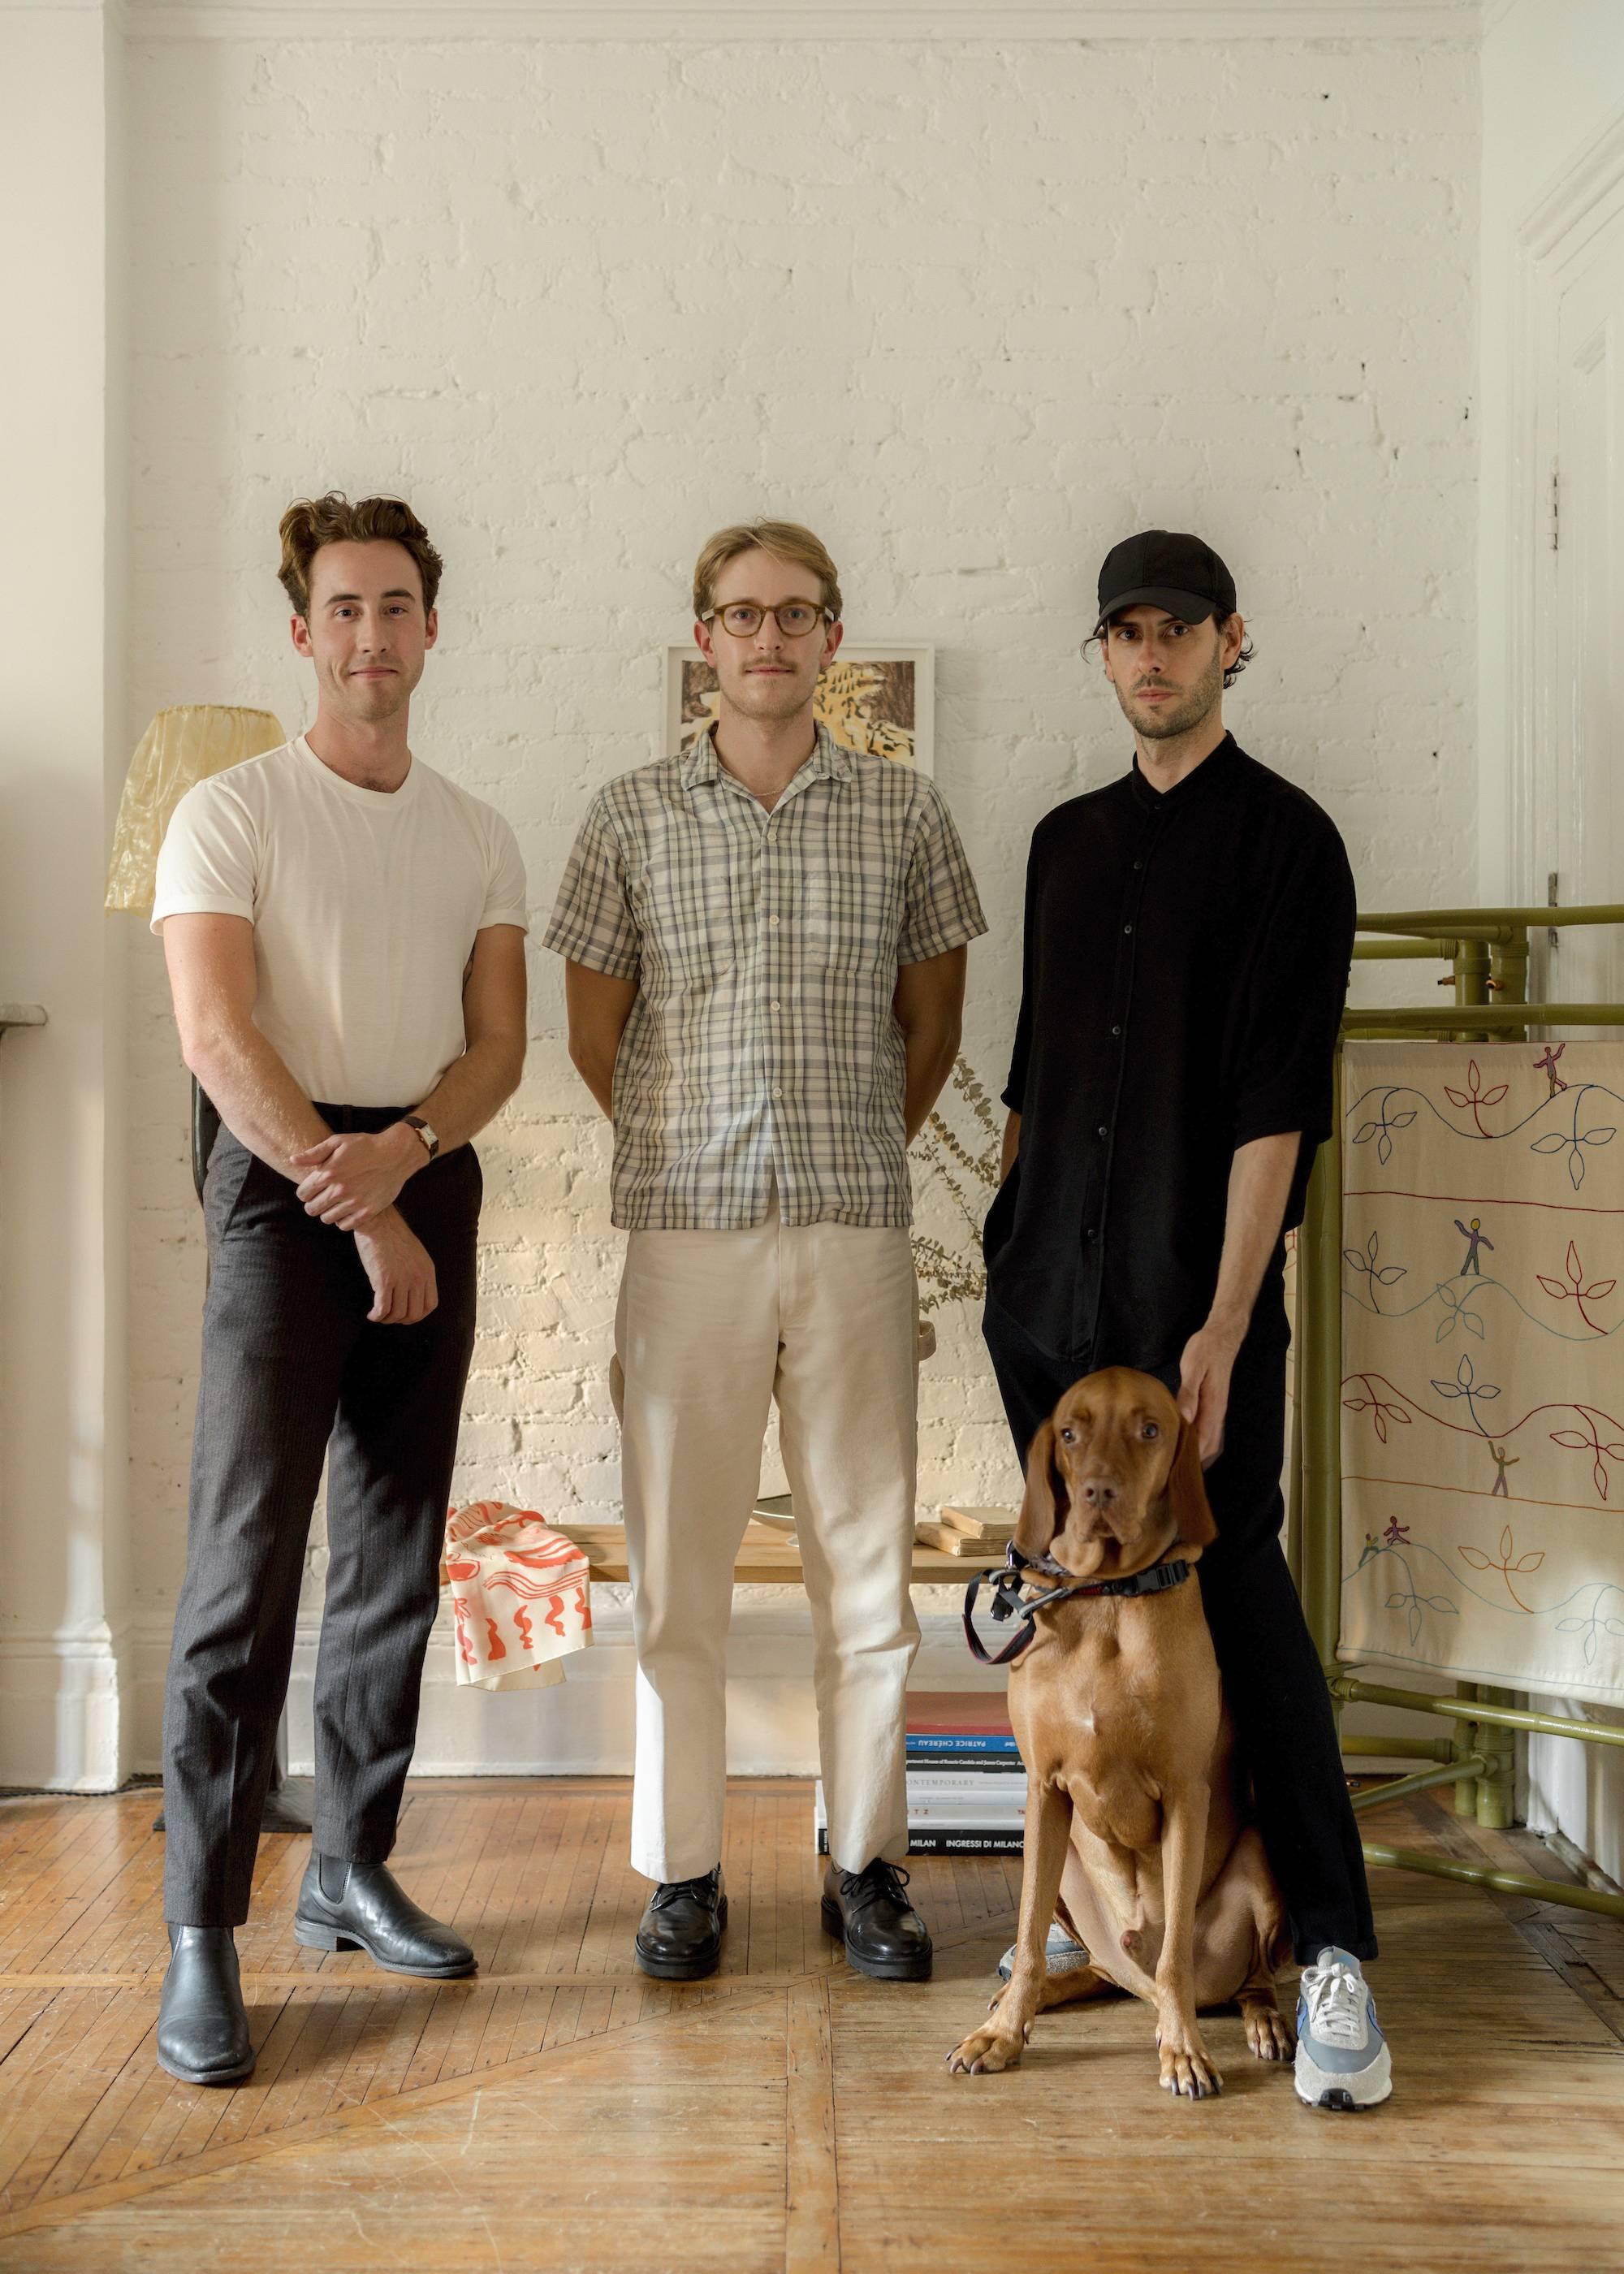 Above (L to R): Ian Felton, Sean Davidson, and Olivier Garcé.